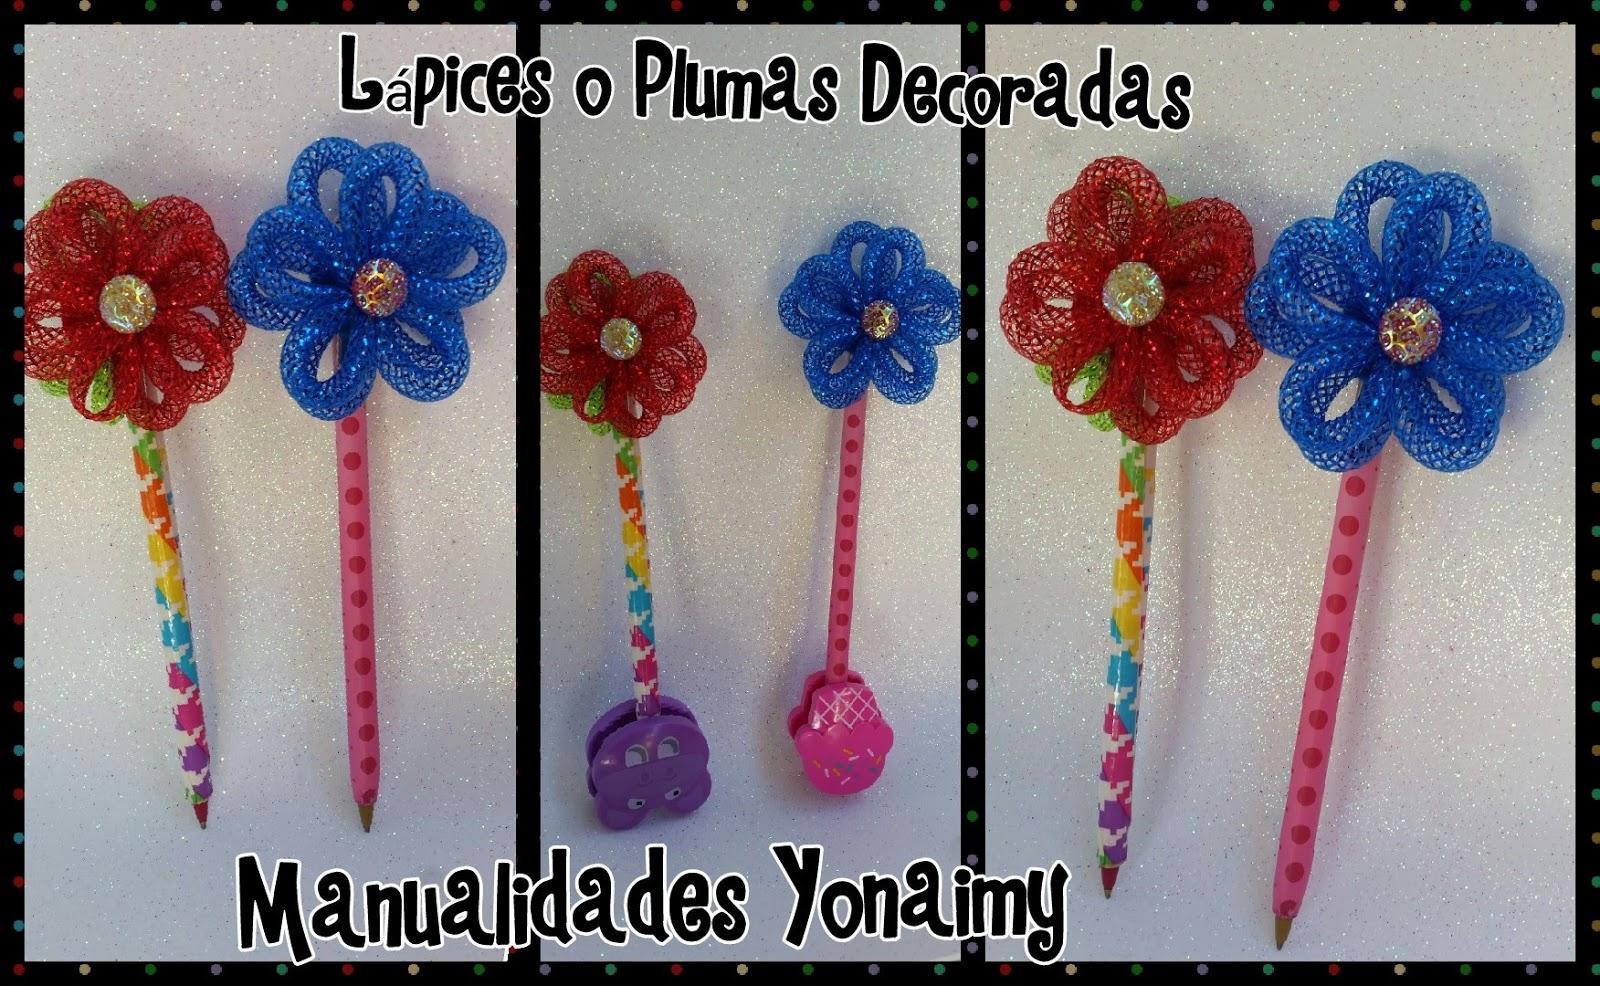 Manualidades yonaimy for Manualidades con plumas